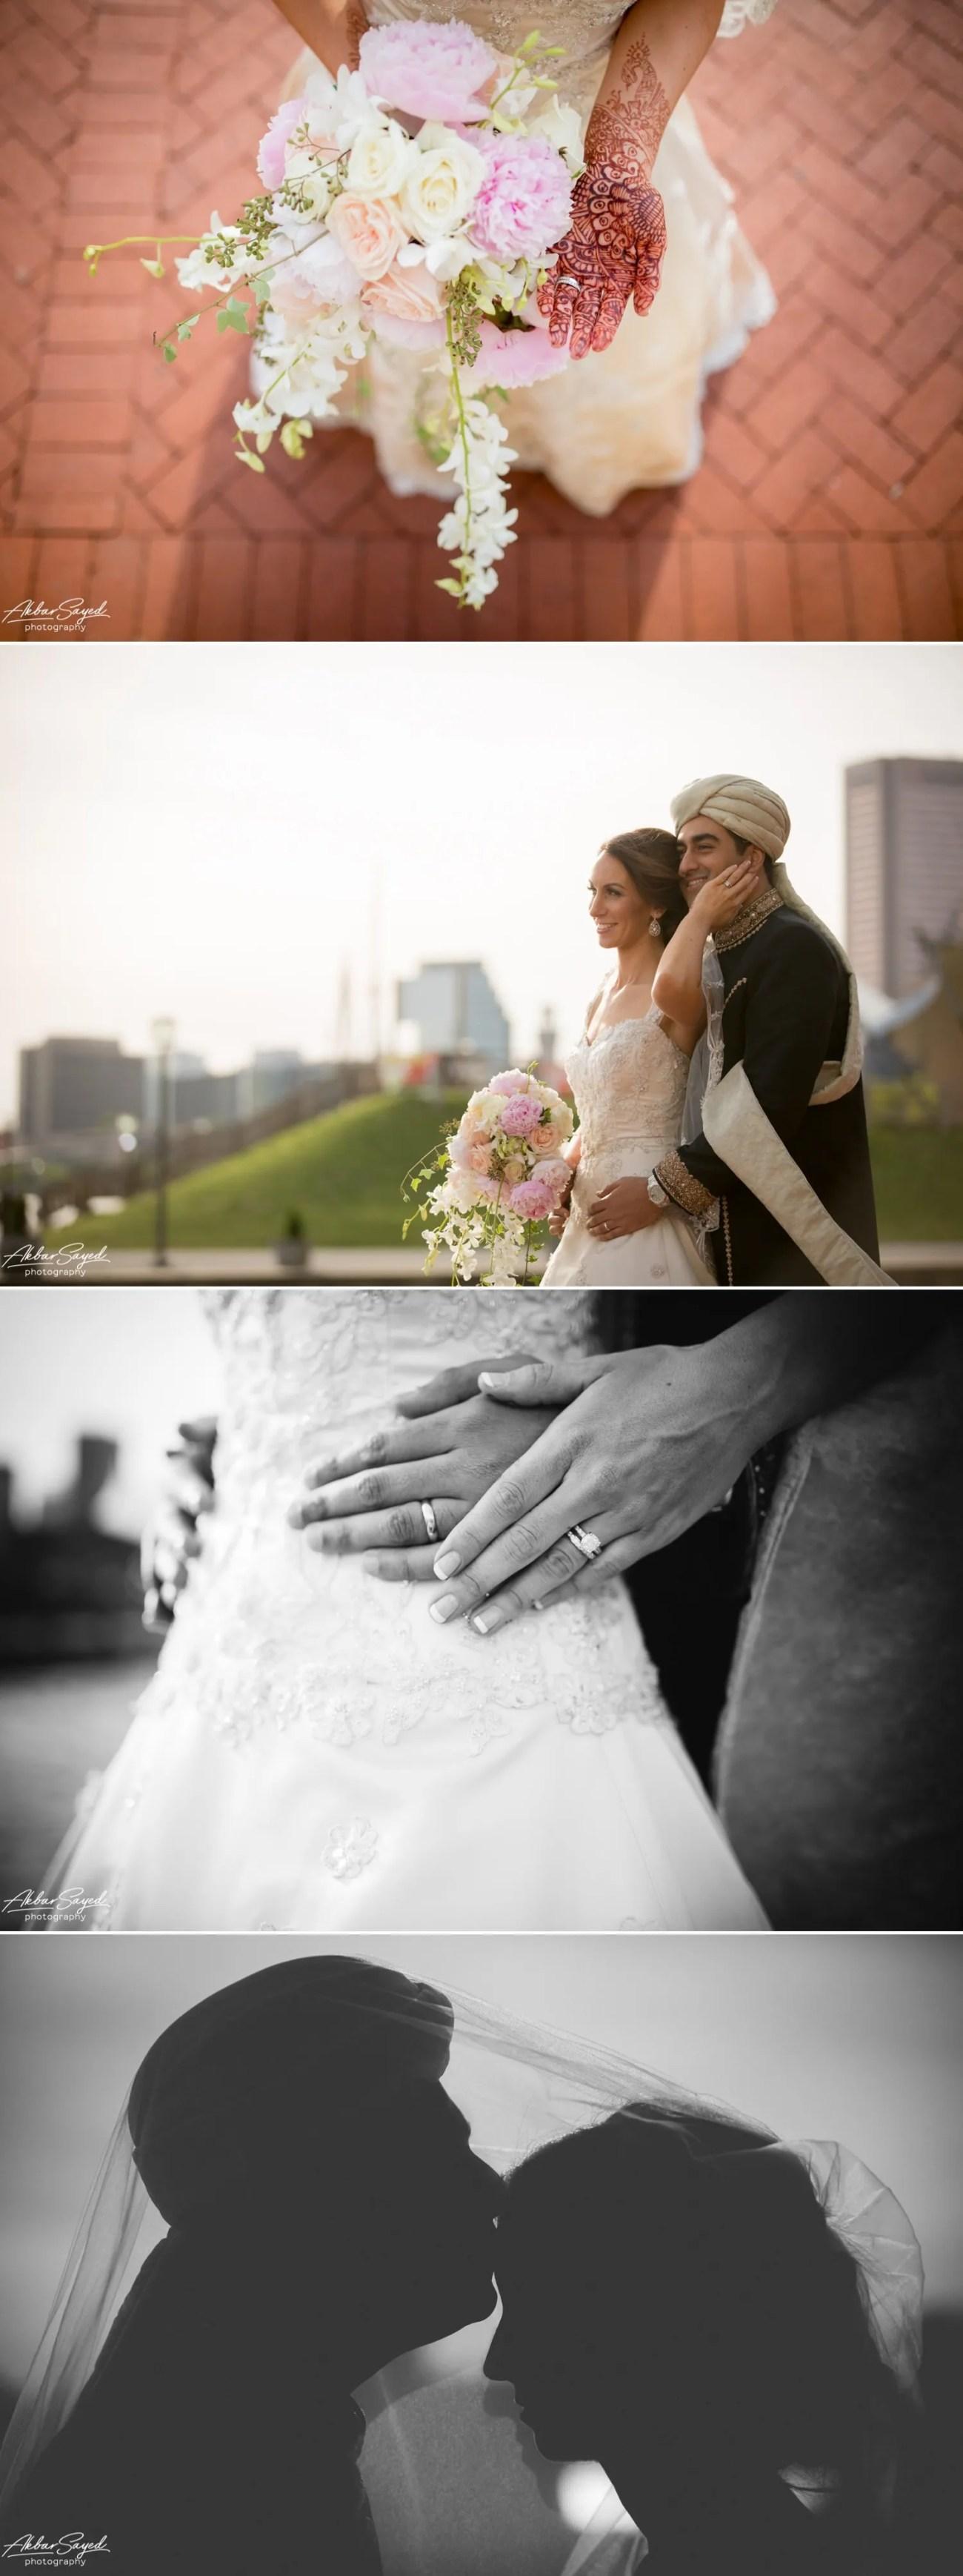 Kathleen and Ali - Baltimore Marriott Waterfront Wedding 12